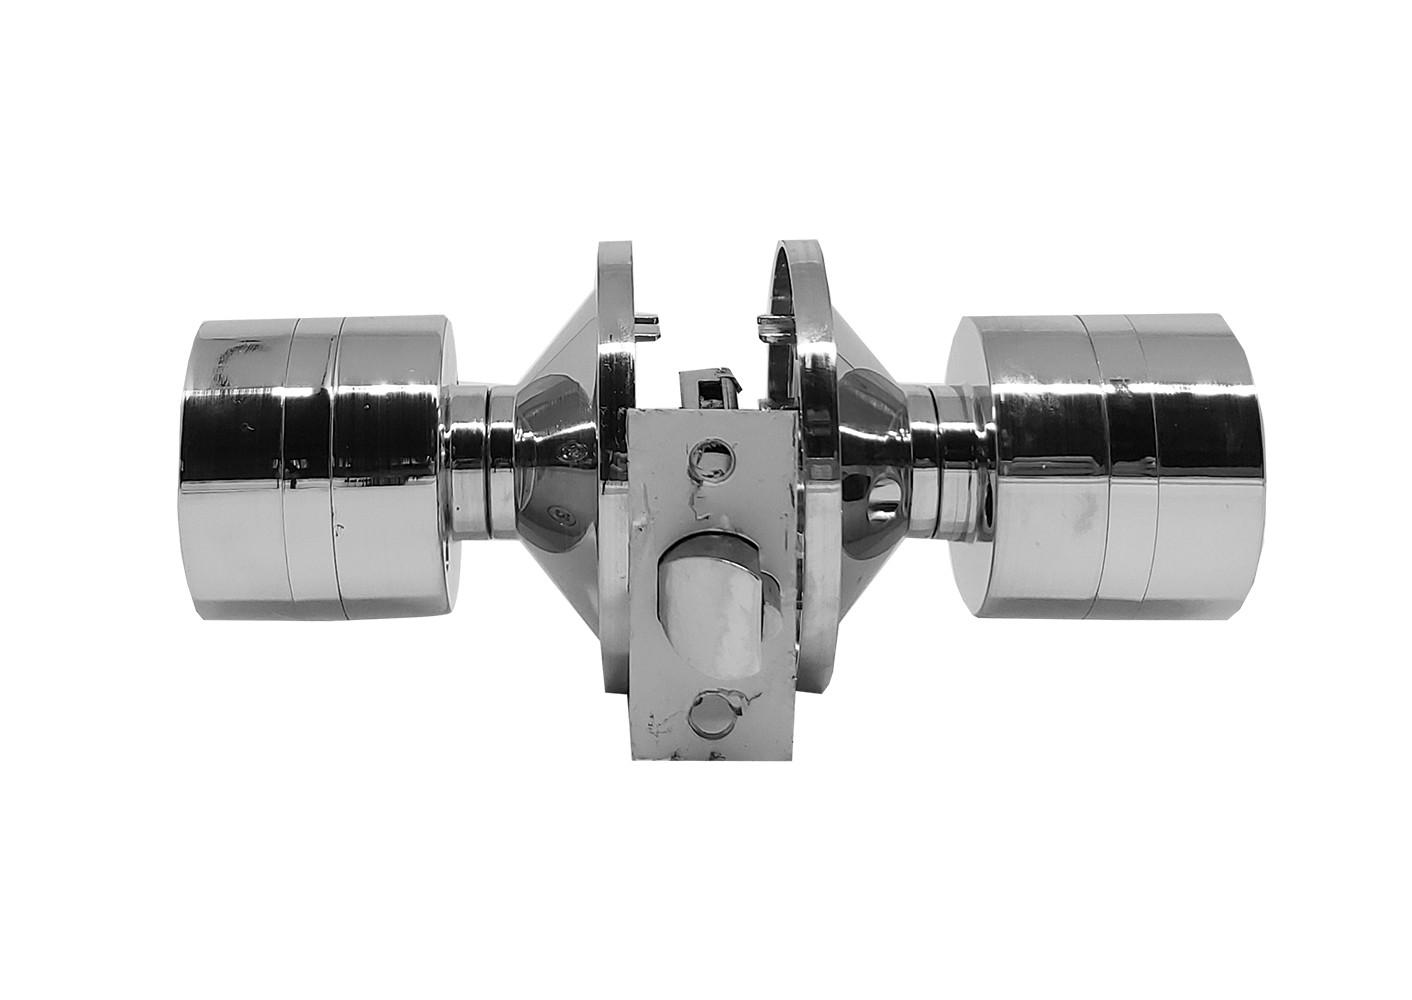 Fechadura Digital Turbock TL-99 P/ Porta Divisoria Senha E Bluetooth - 42113